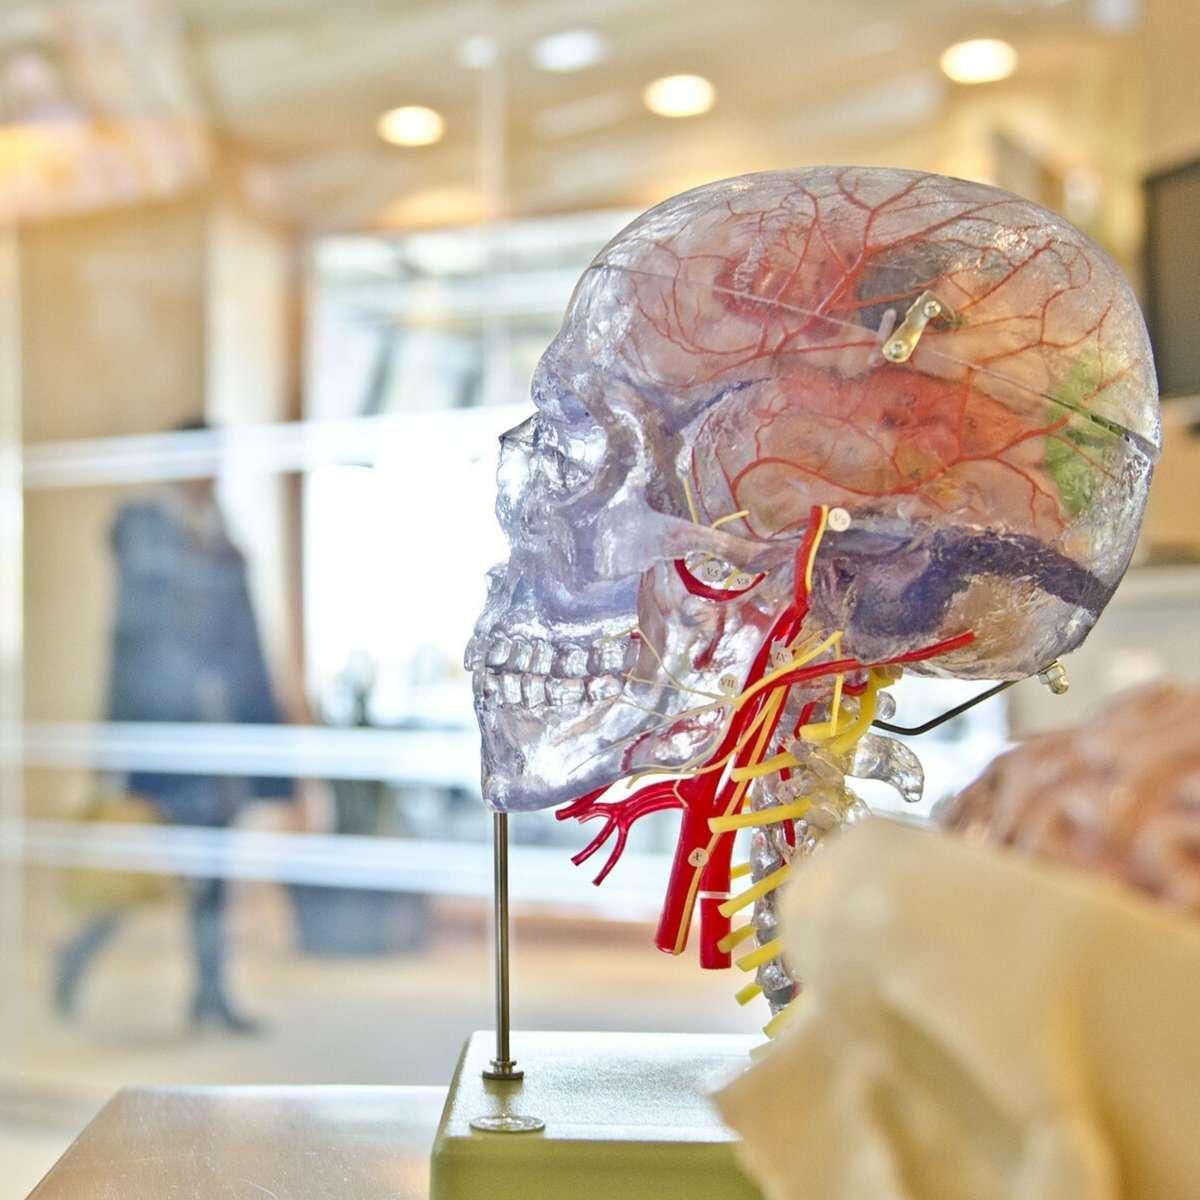 PEMF and epilepsy